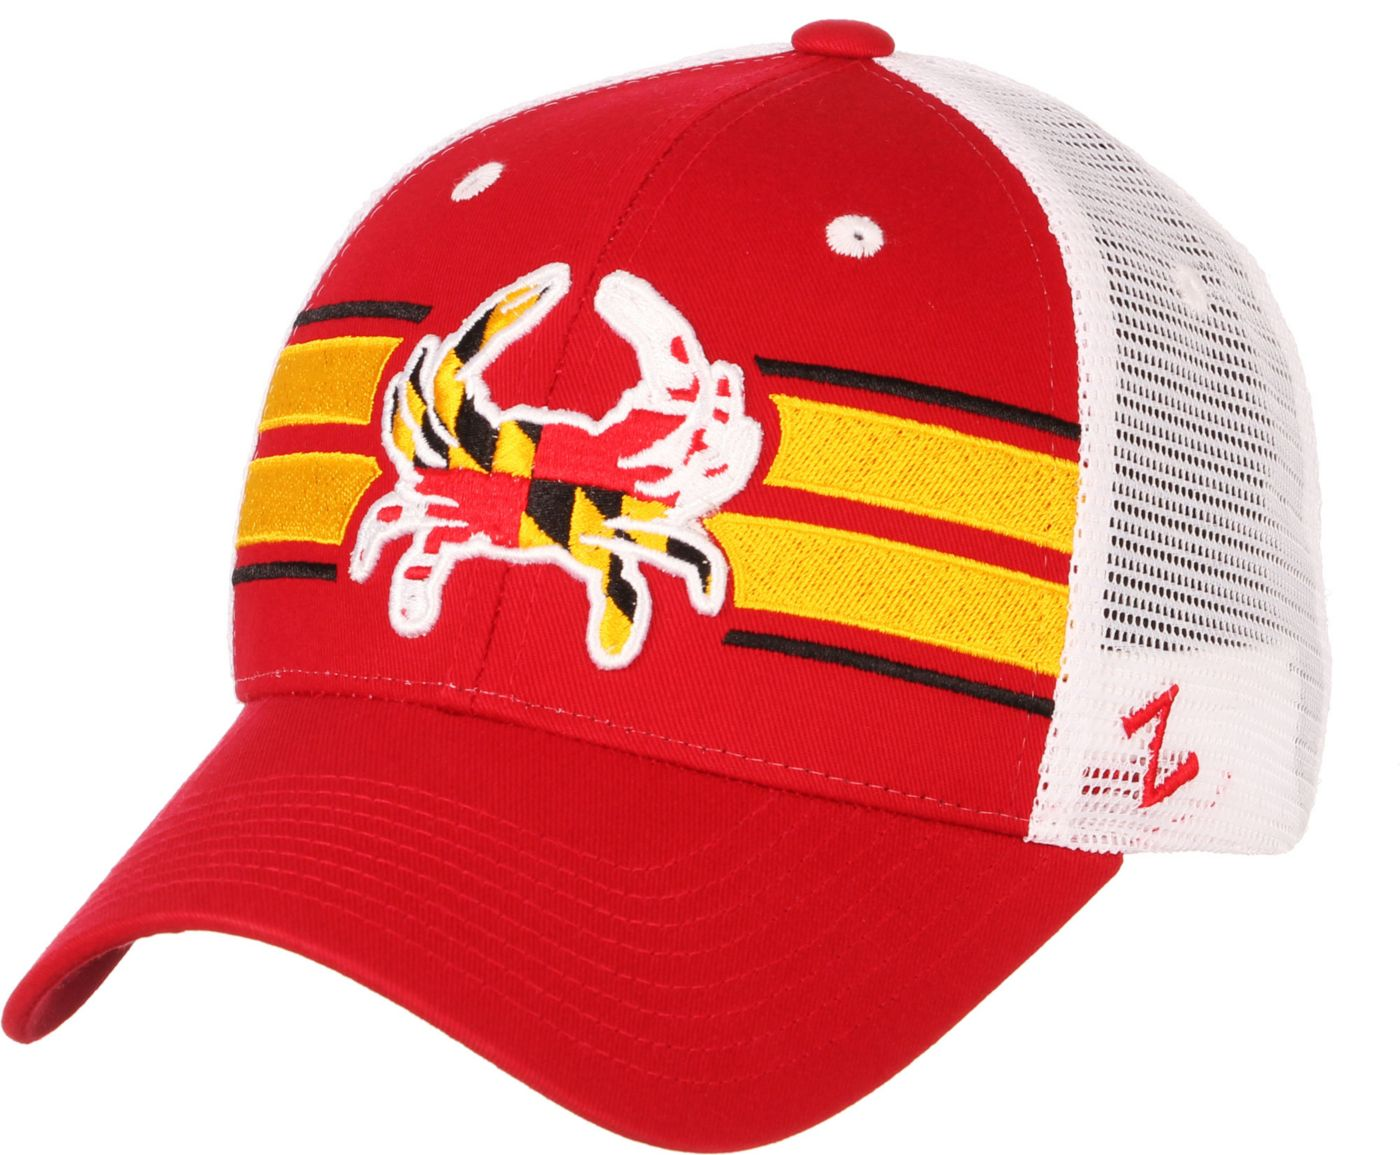 Zephyr Men's Maryland Terrapins Red/White 'Maryland Pride' Adjustable Hat